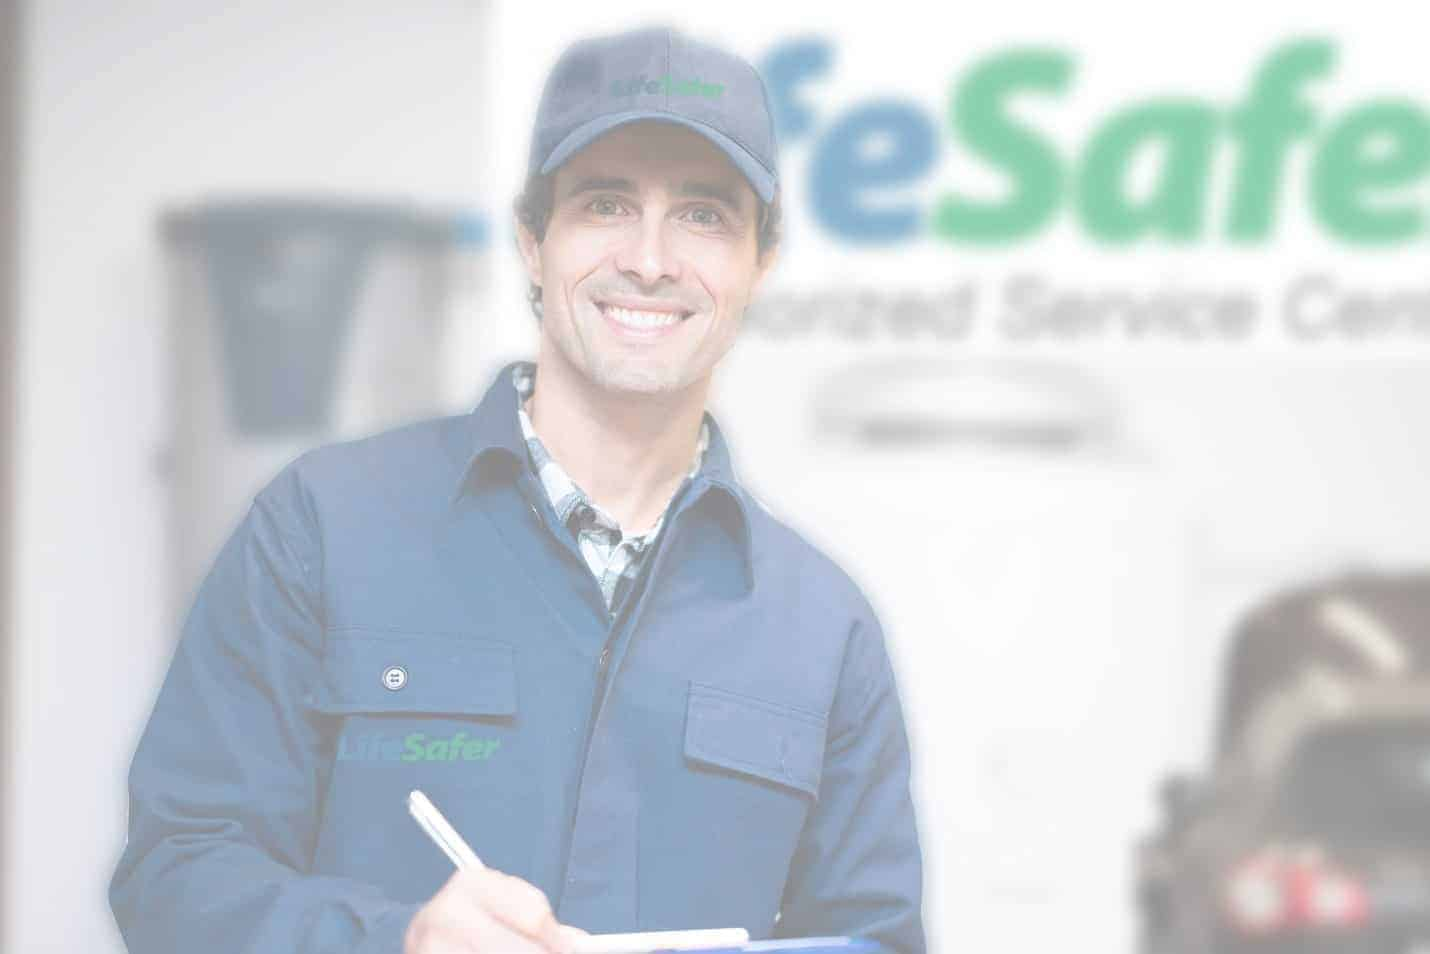 LifeSafer-service